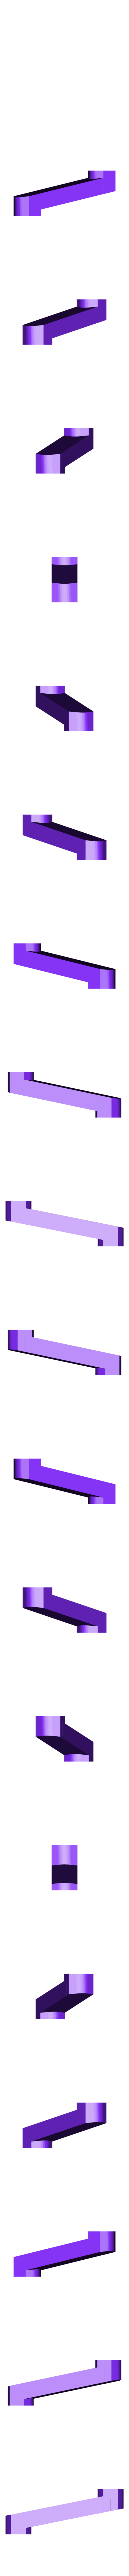 Zyllis_crank.STL Download free STL file Zyliss spare crank • Model to 3D print, KarmaPrinting